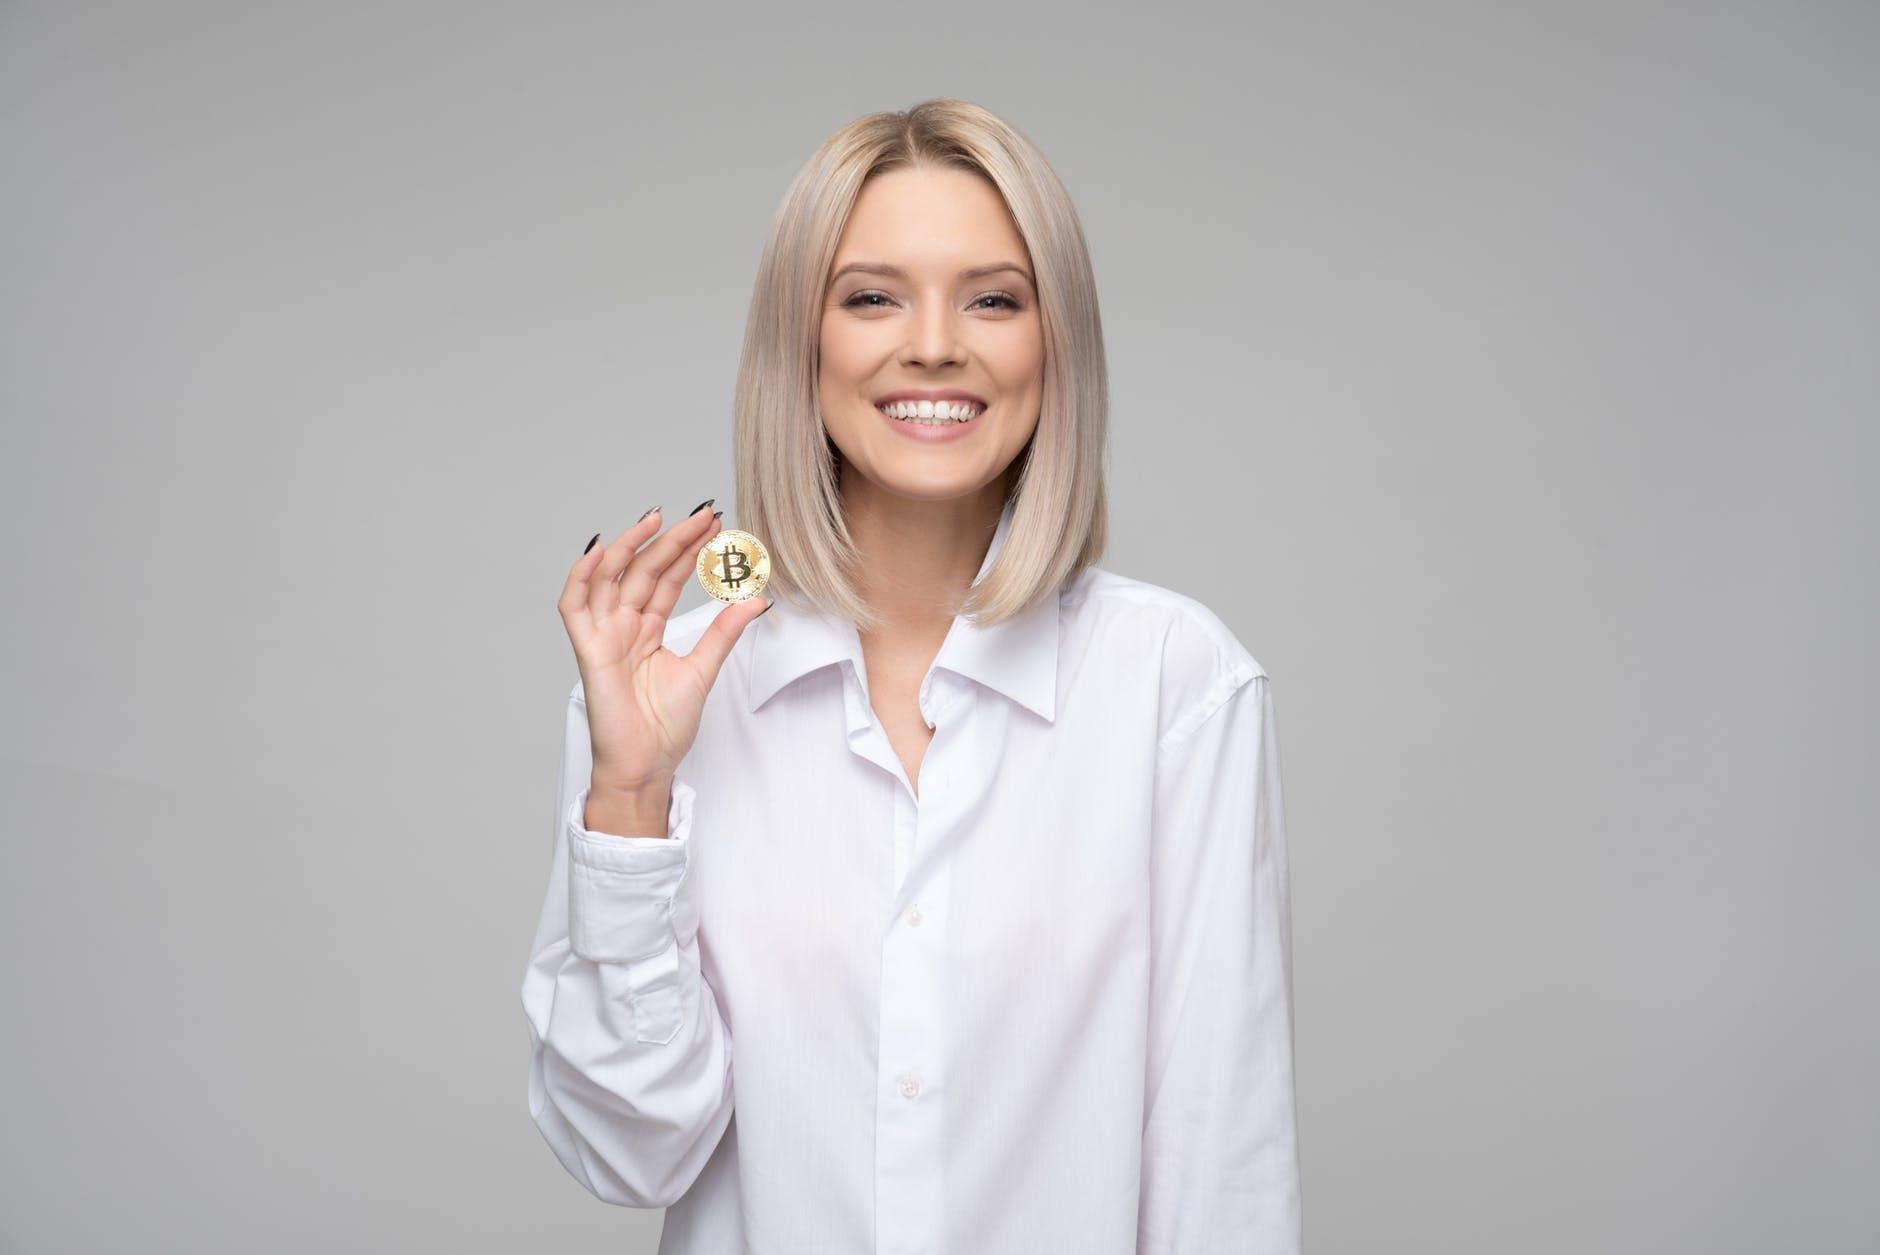 women wearing white long sleeved collared shirt holding bitcoin